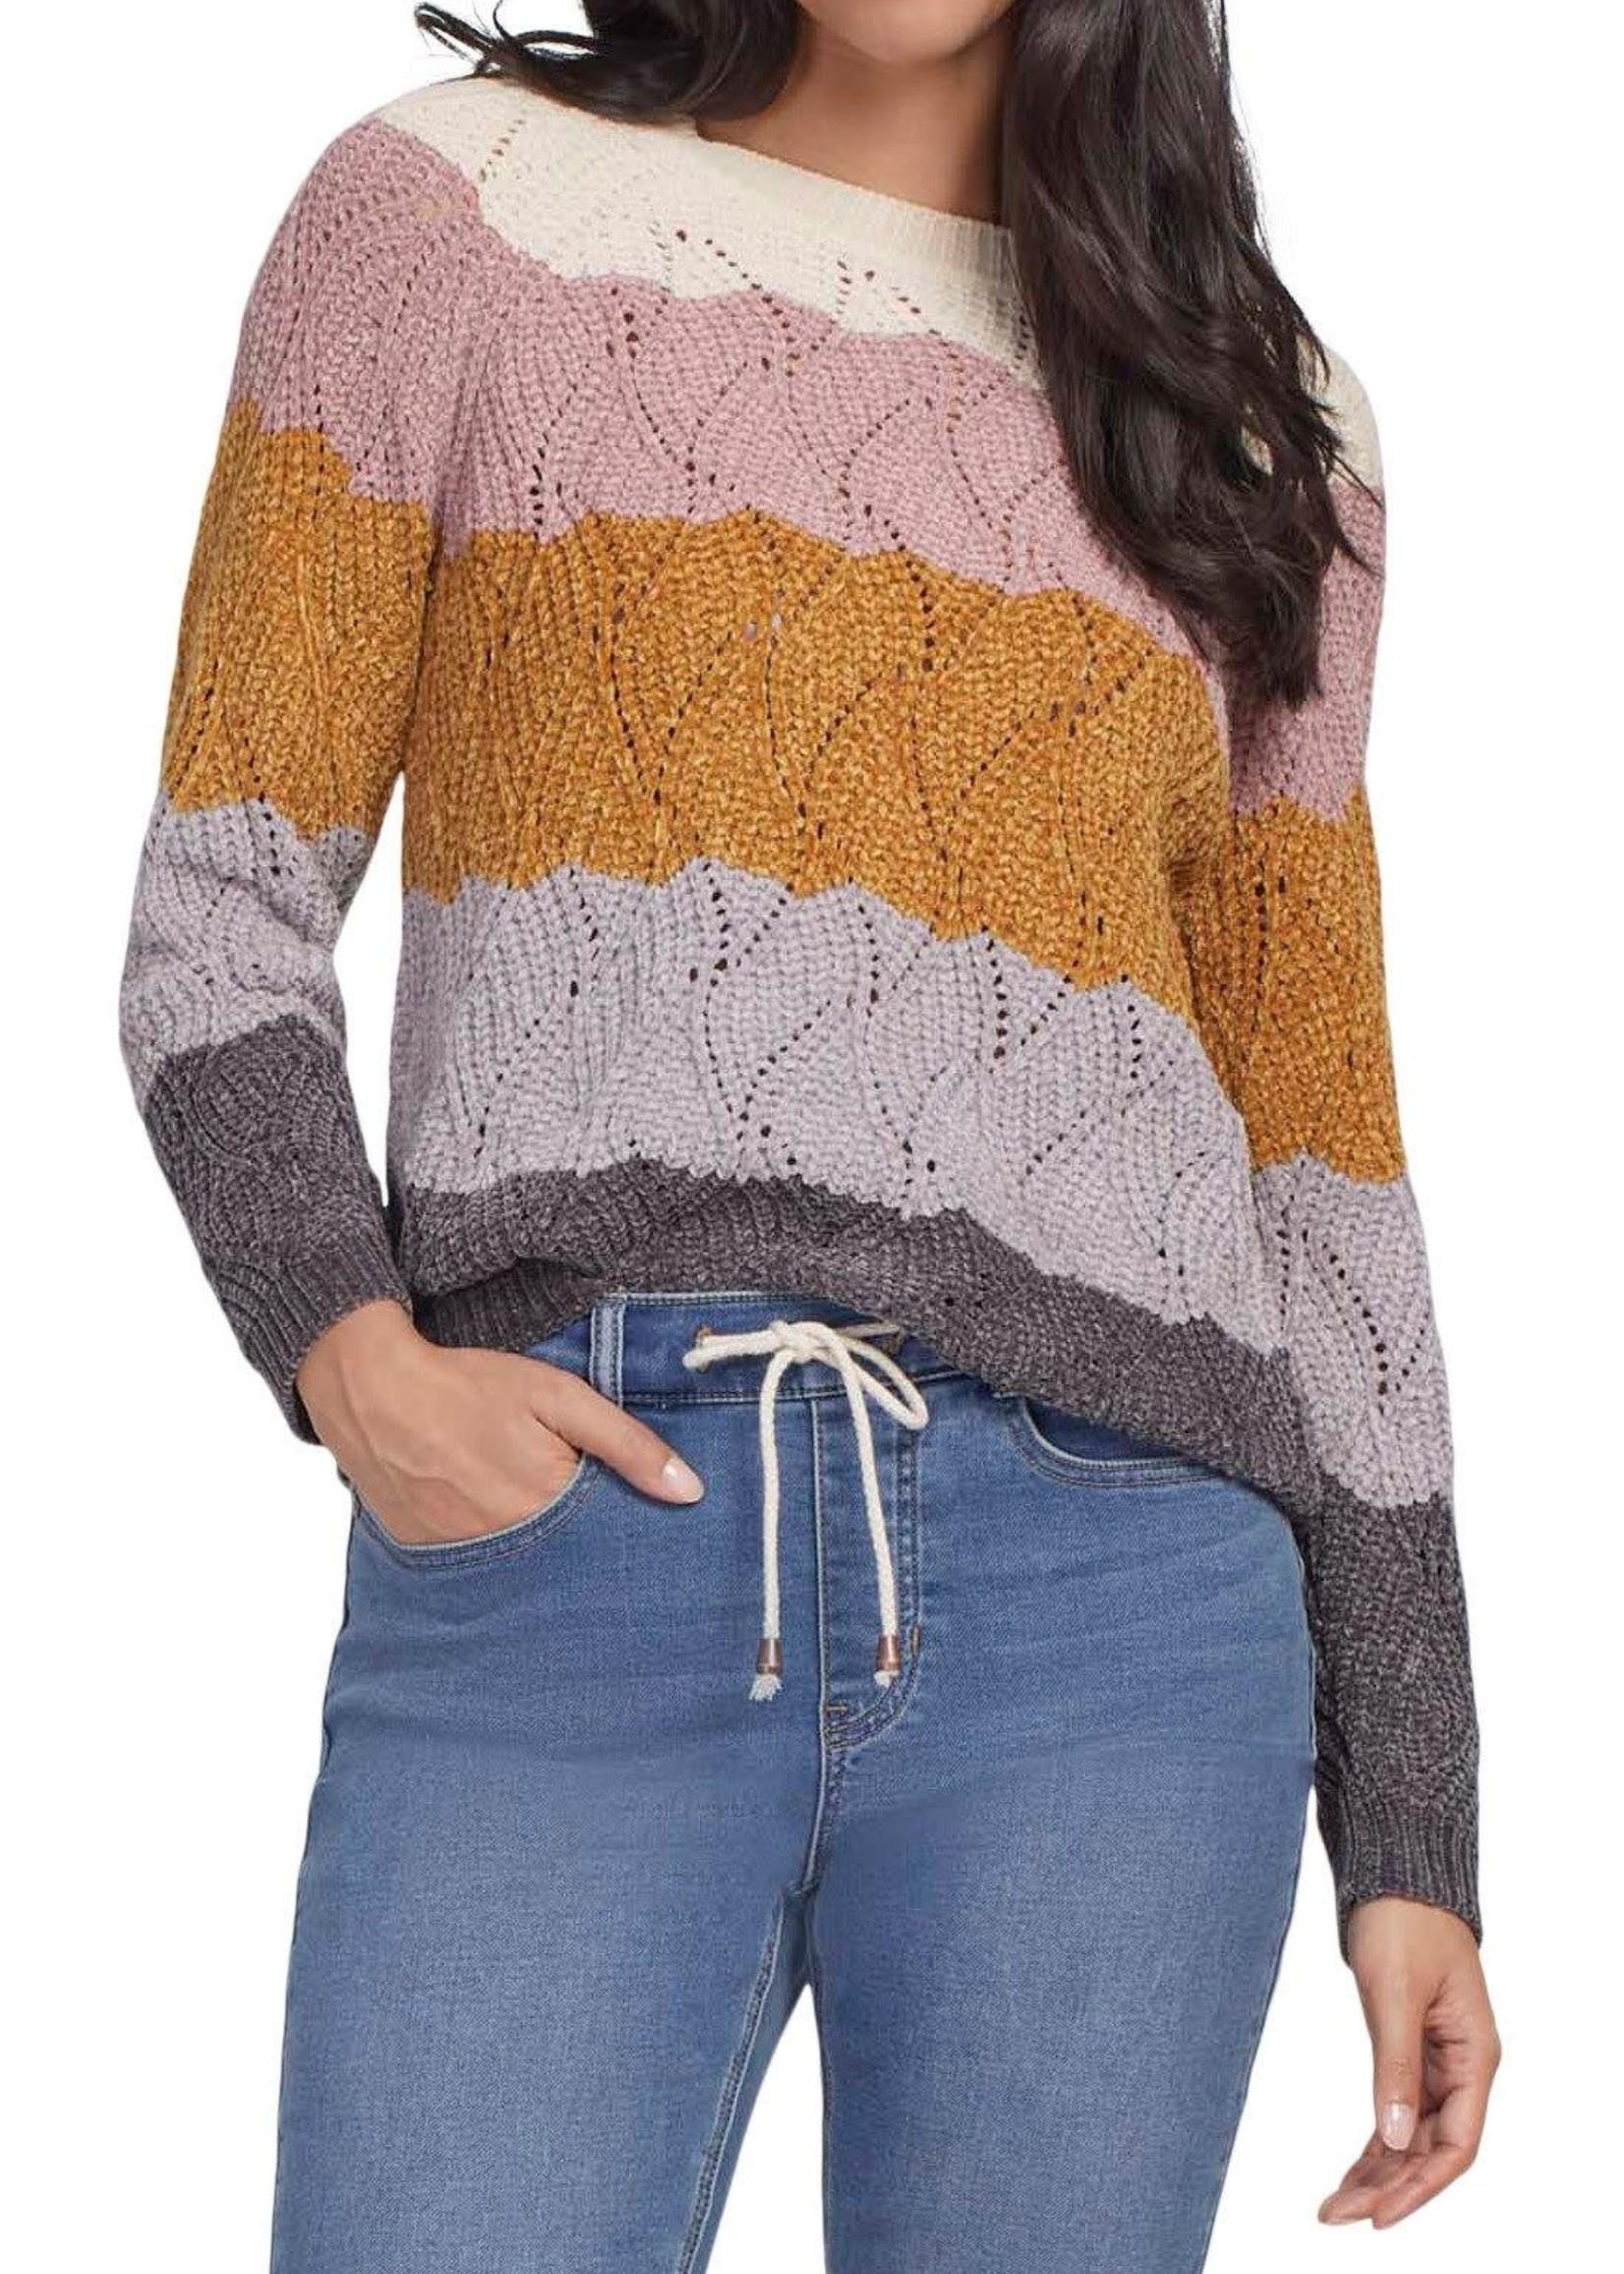 Tribal Tribal Crew Neck Sweater